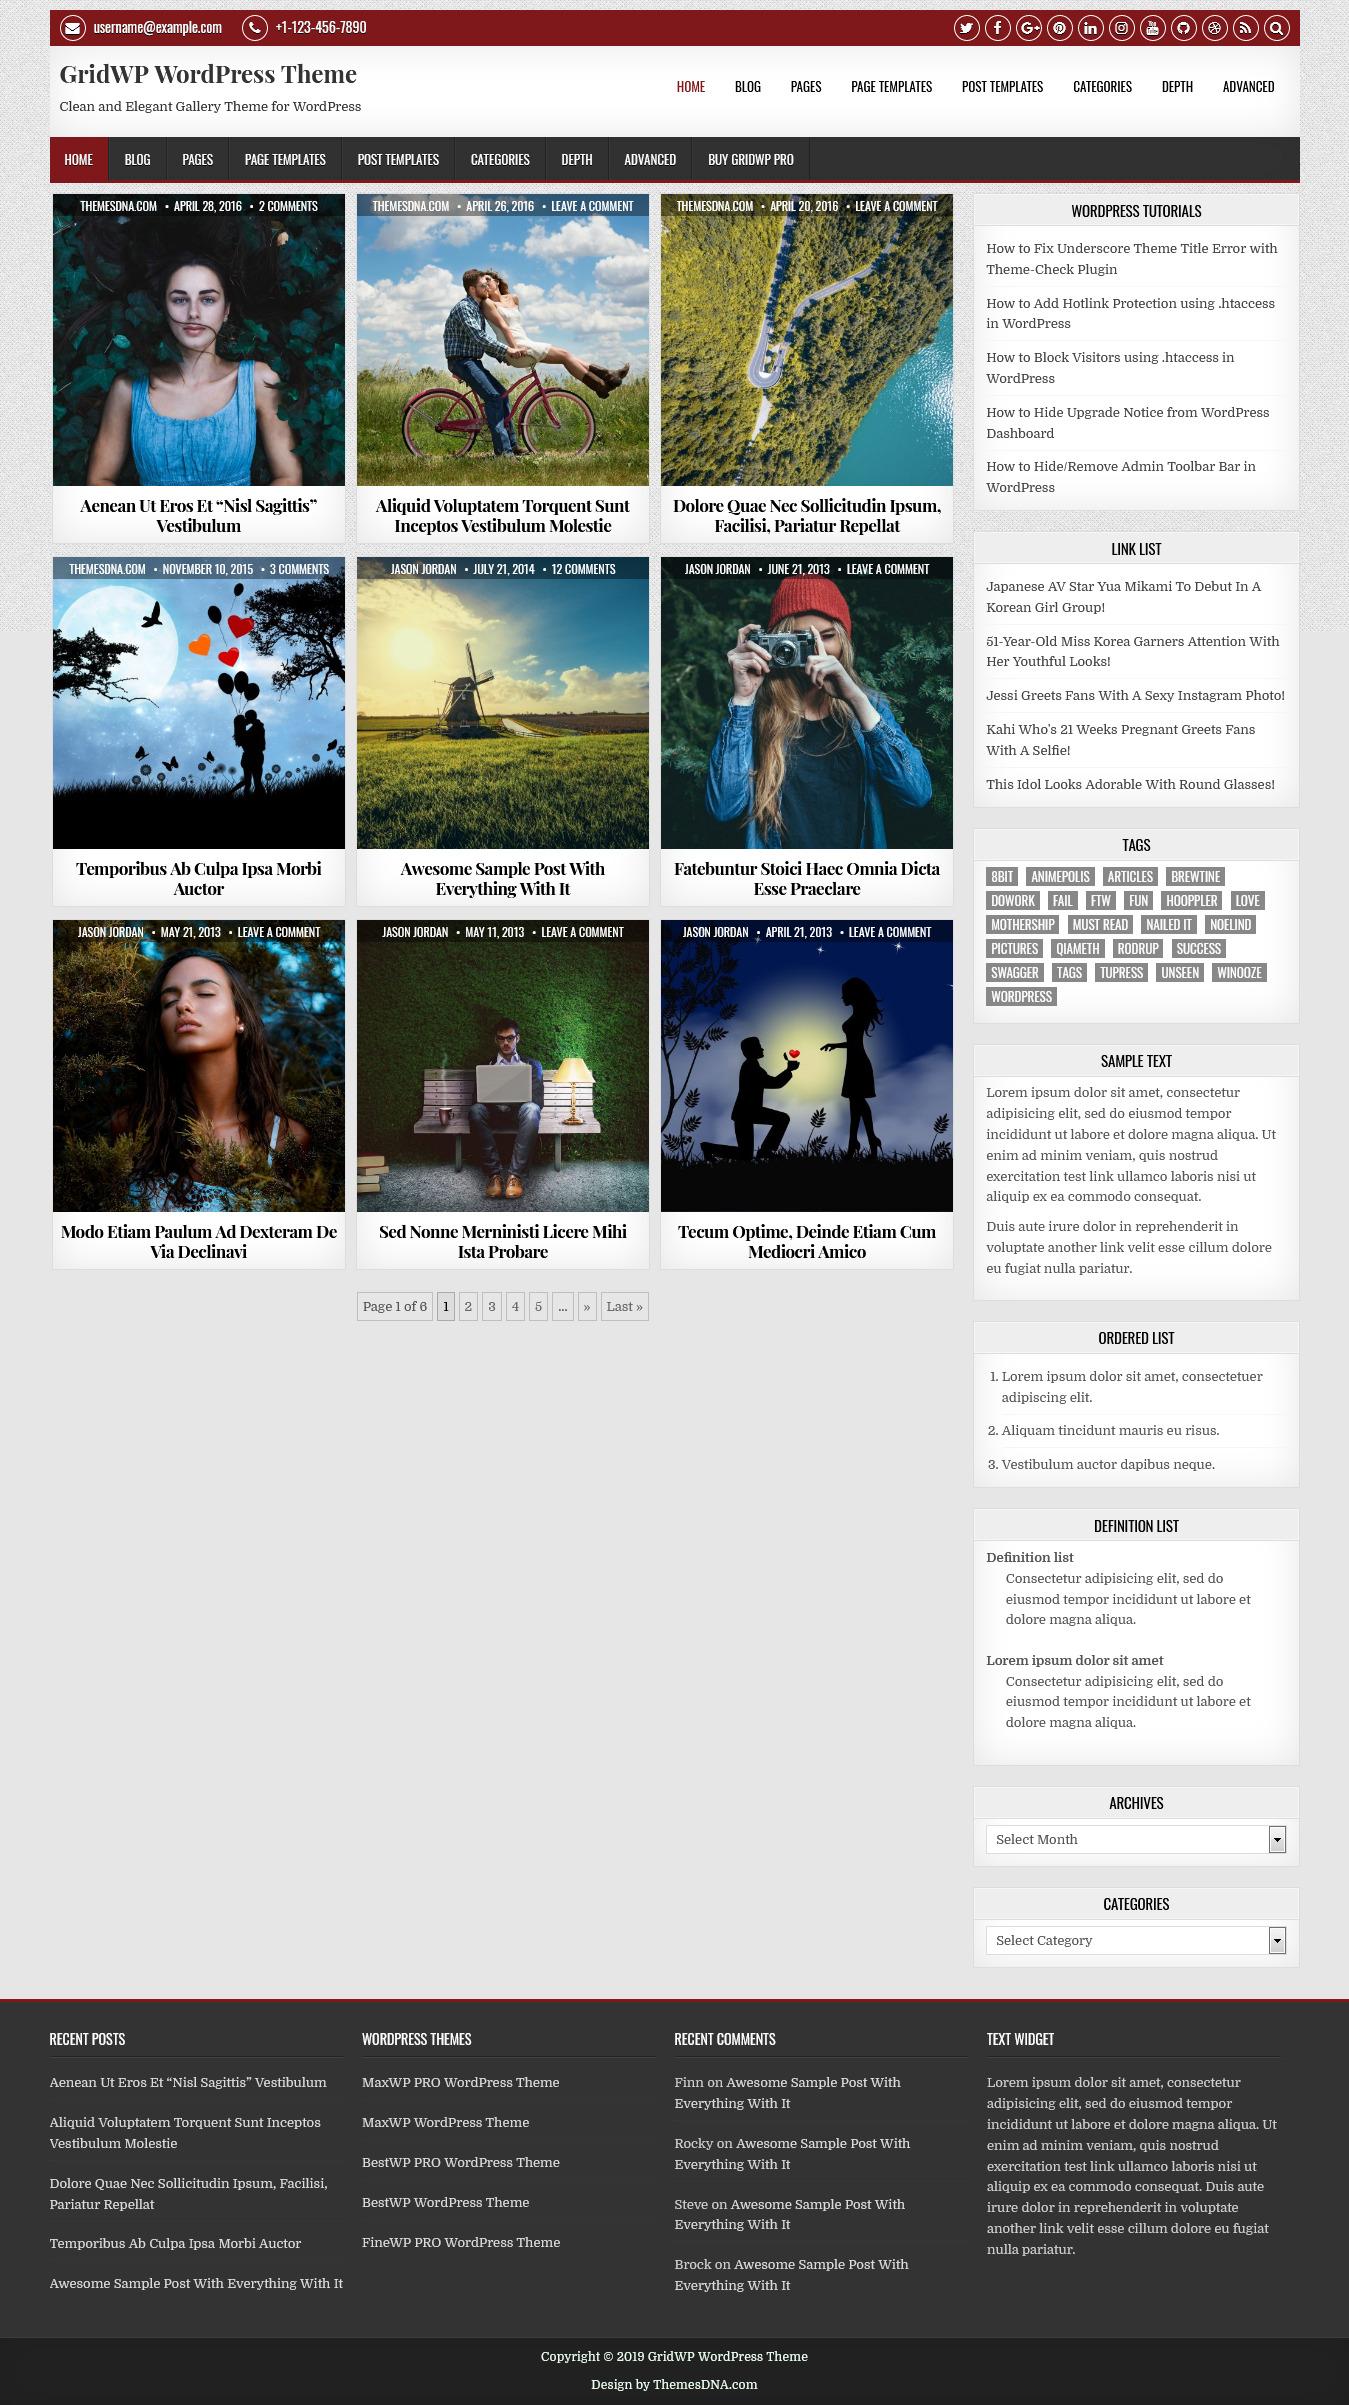 GridWP - Best Free Gallery WordPress Theme